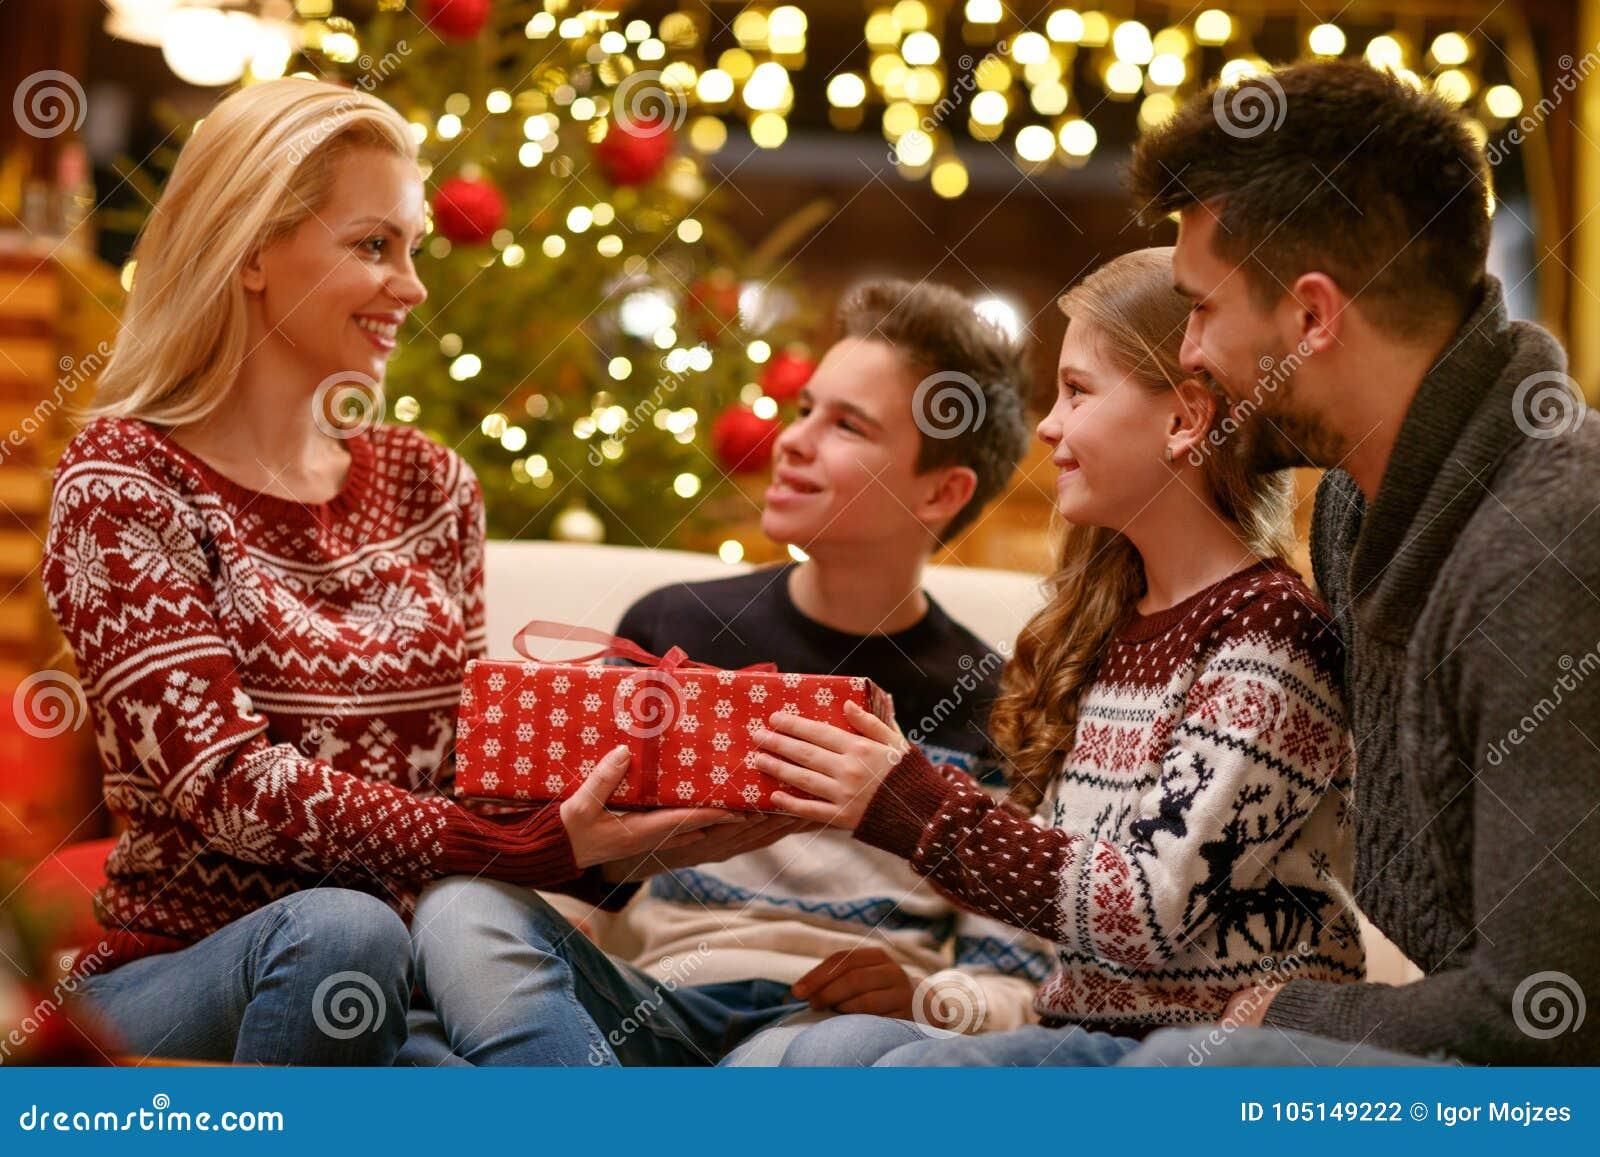 Family Christmas Gift Giving.Family Christmas Giving Gifts Stock Photo Image Of Father